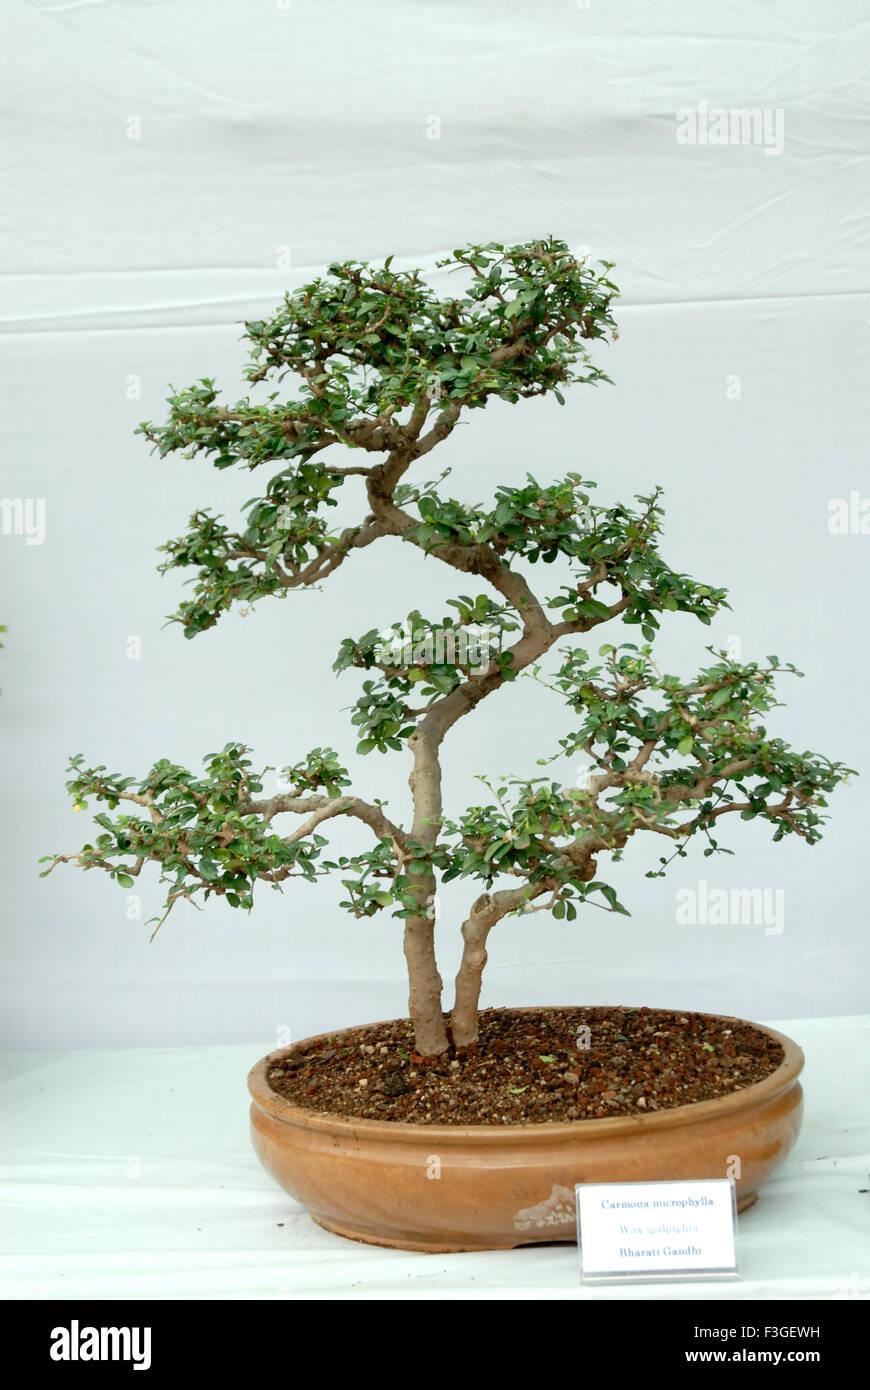 Plant Carmona Microphylla Bonsai Tree Earthen Pot With Soil Stock Photo Alamy